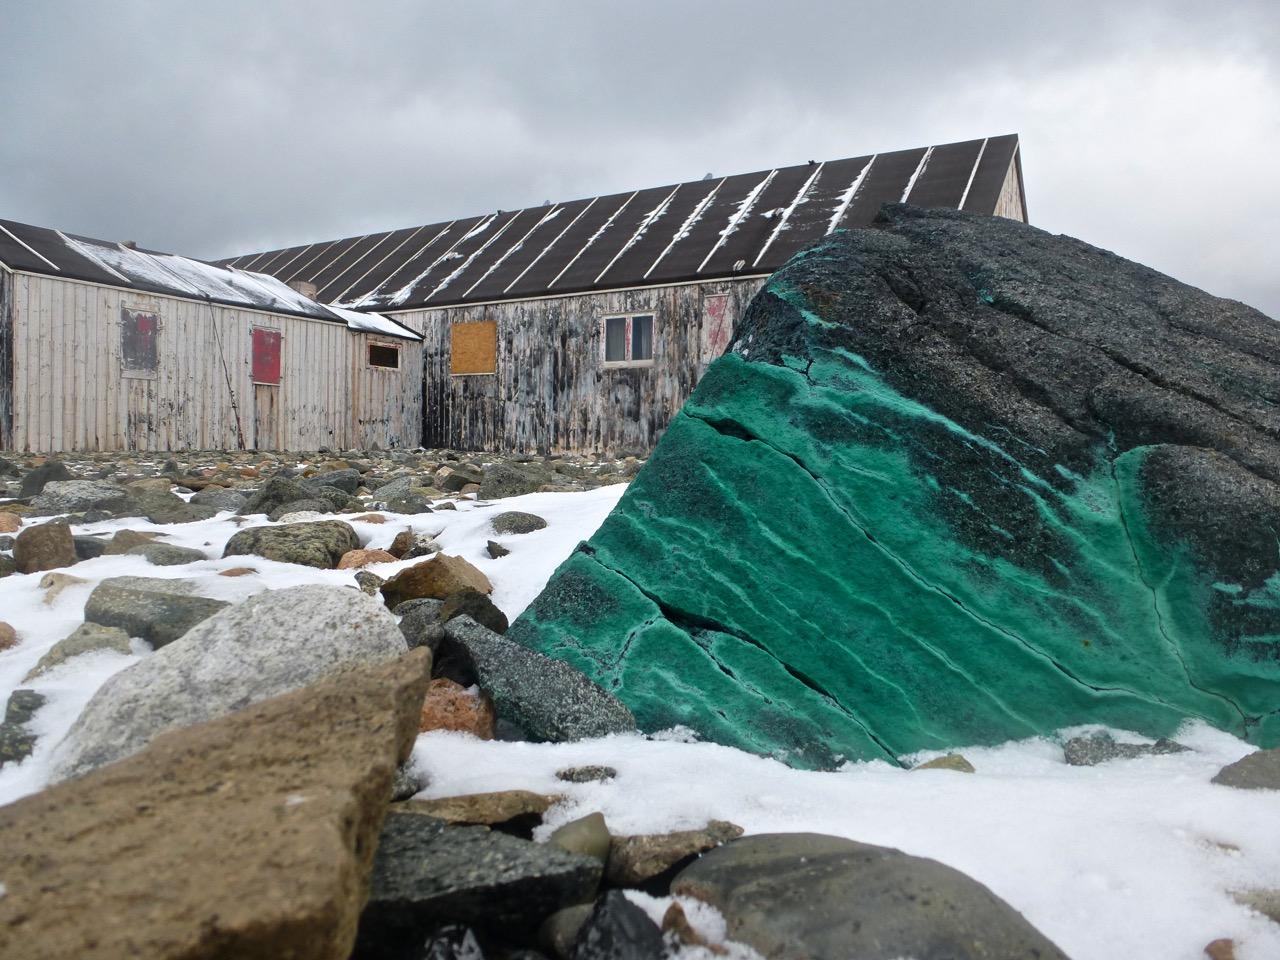 Horseshoe Hütte